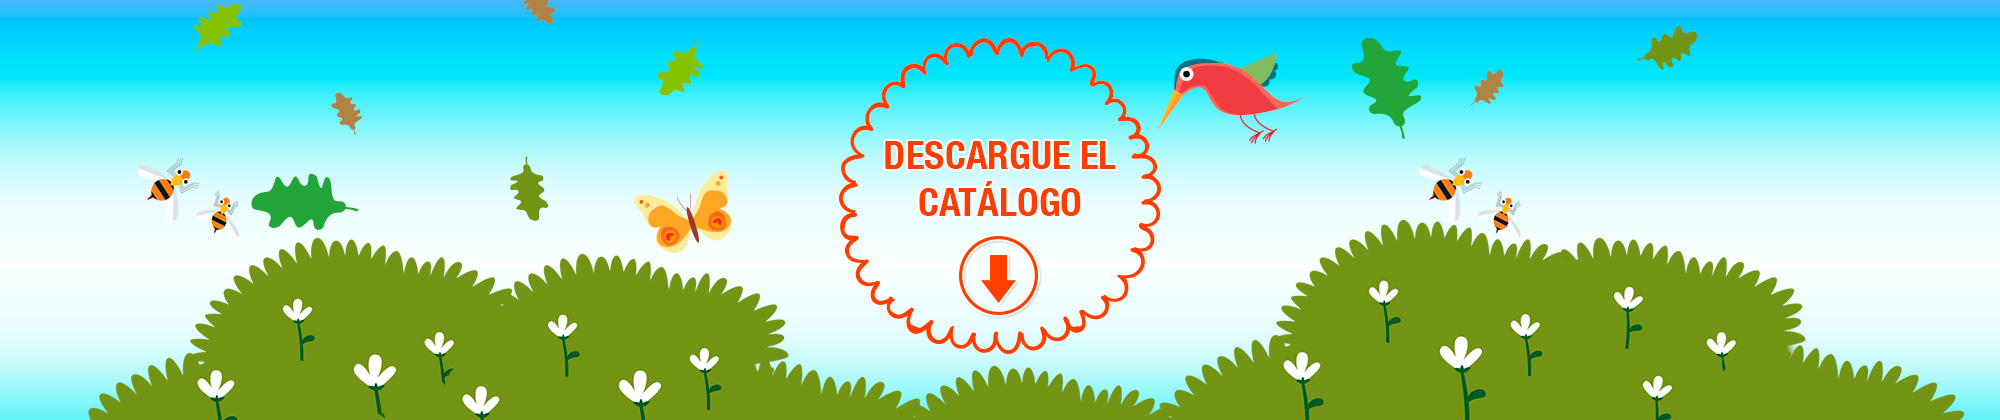 VV Kids Descargue Catálogo